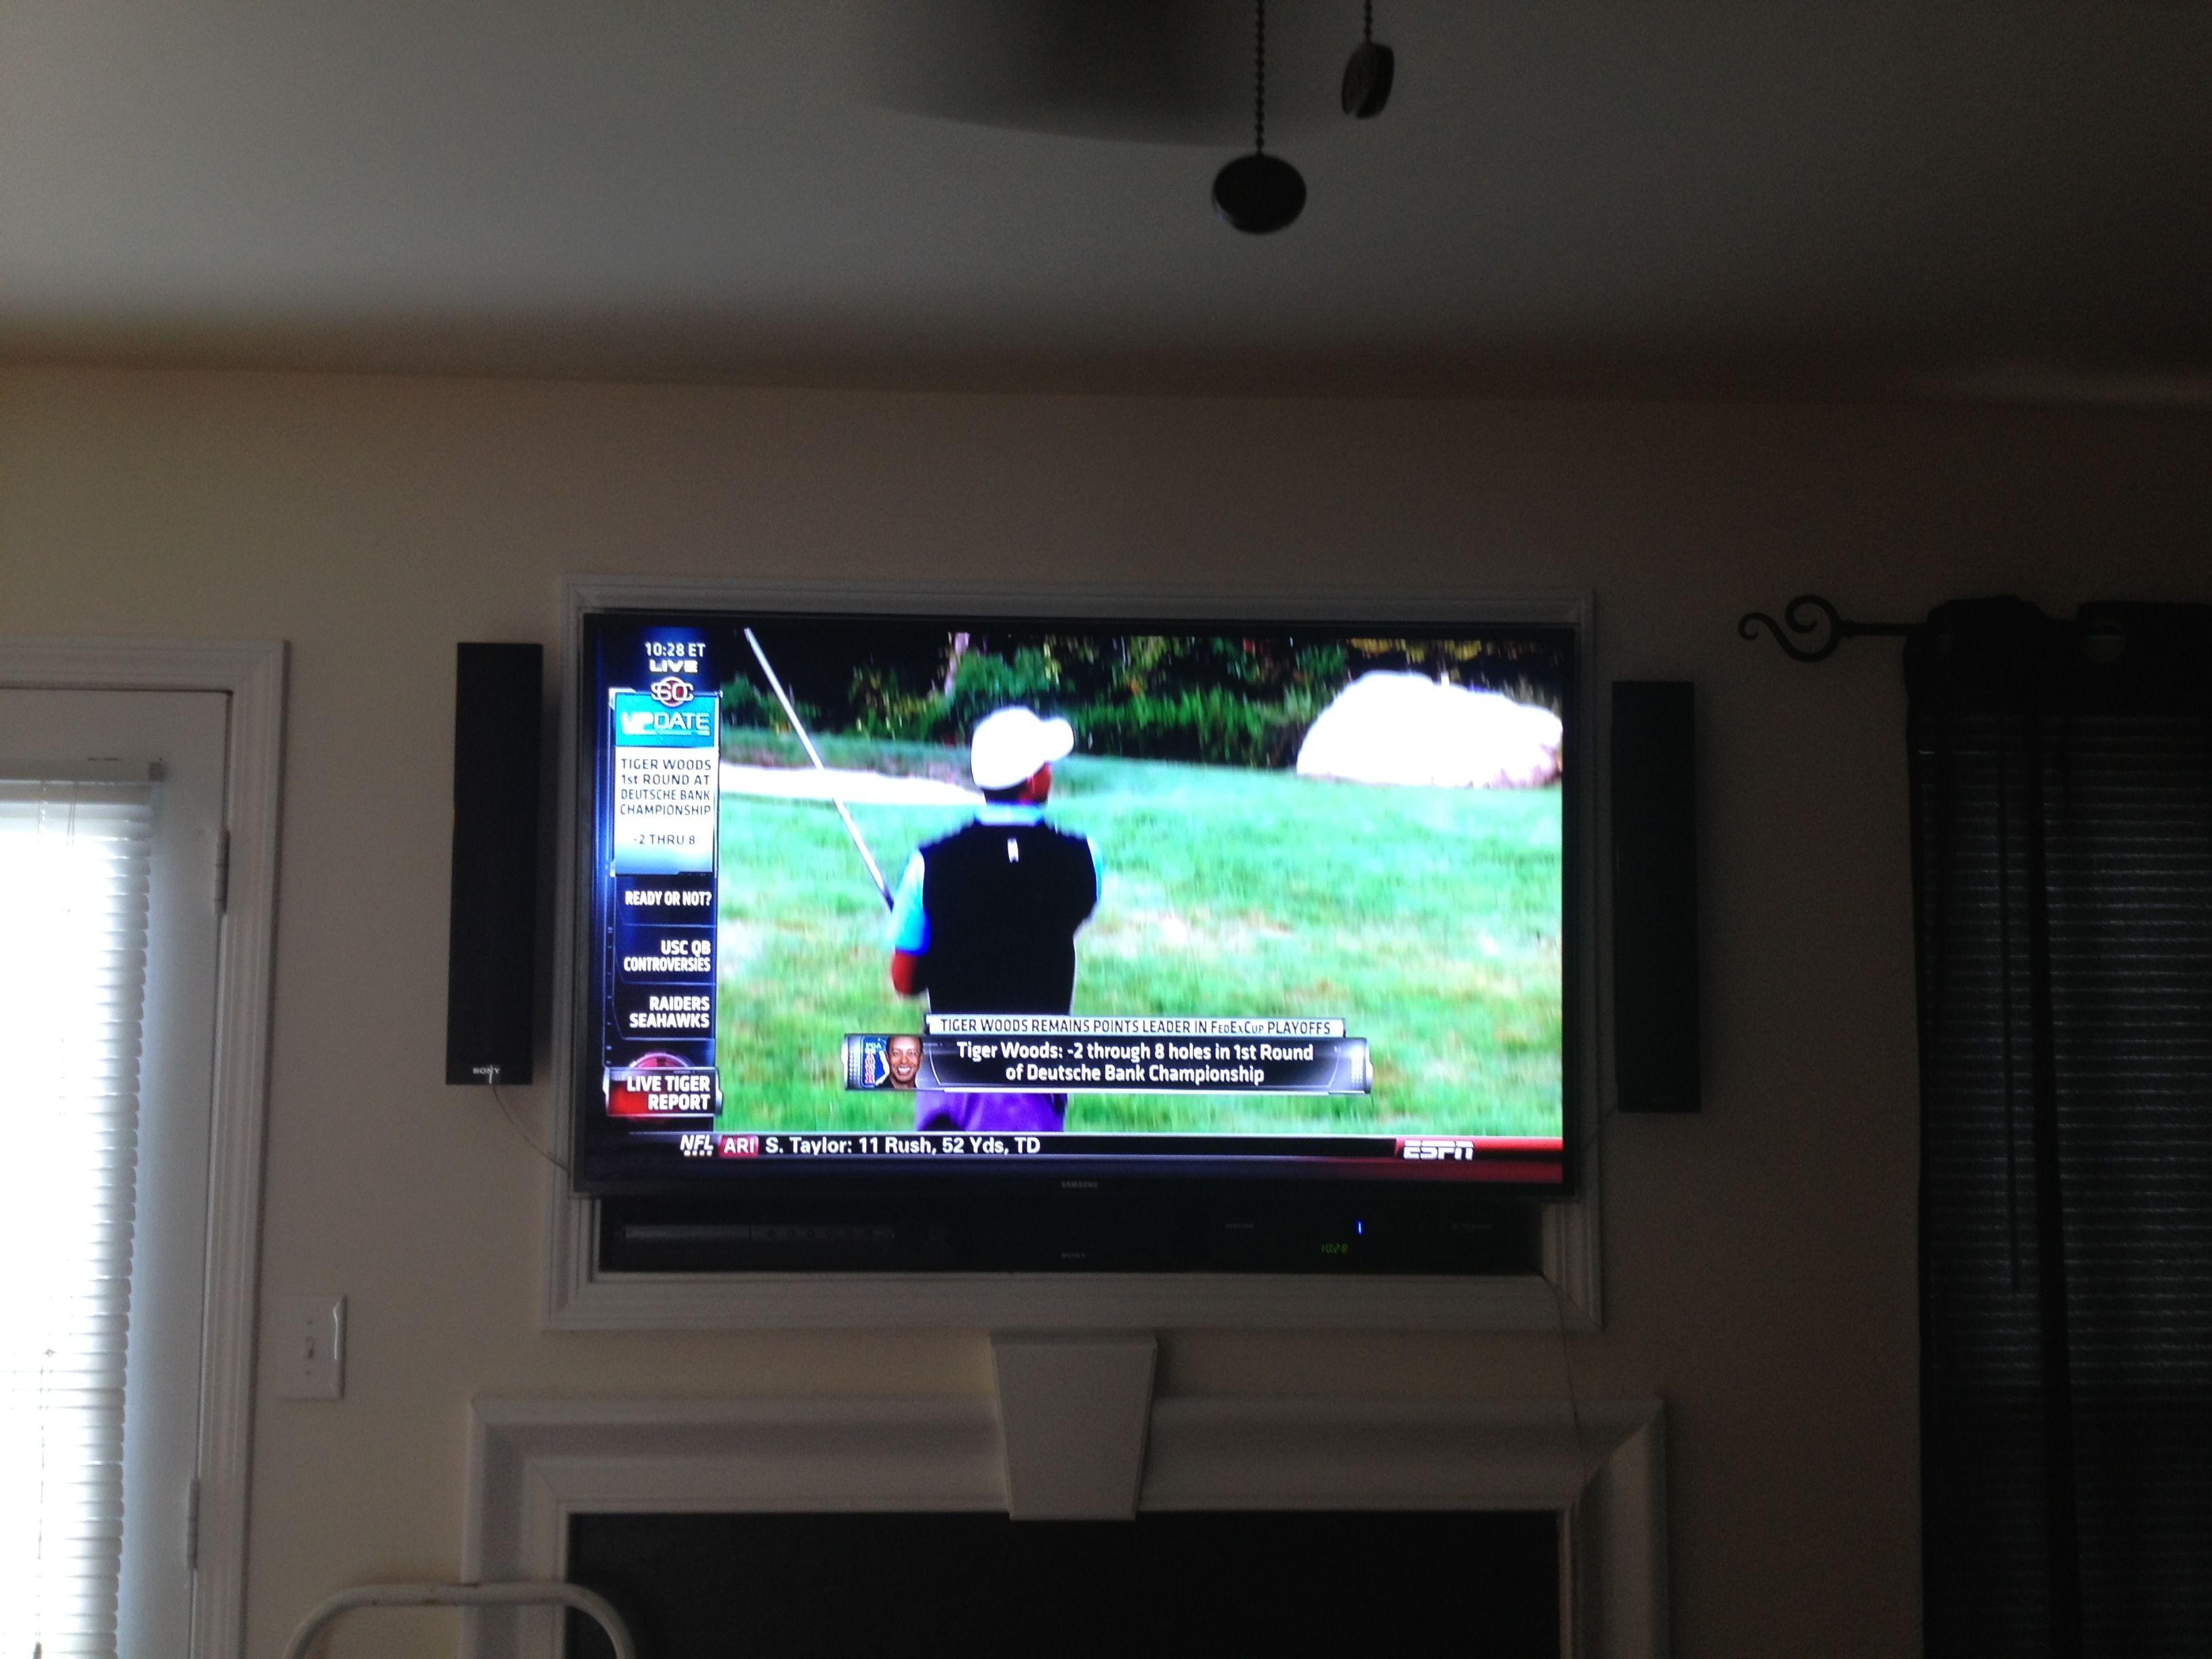 charlotte home theater installation projector surround wiring tv mounting flatscreen tv speaker installation 704 905 2965 [ 3264 x 2448 Pixel ]